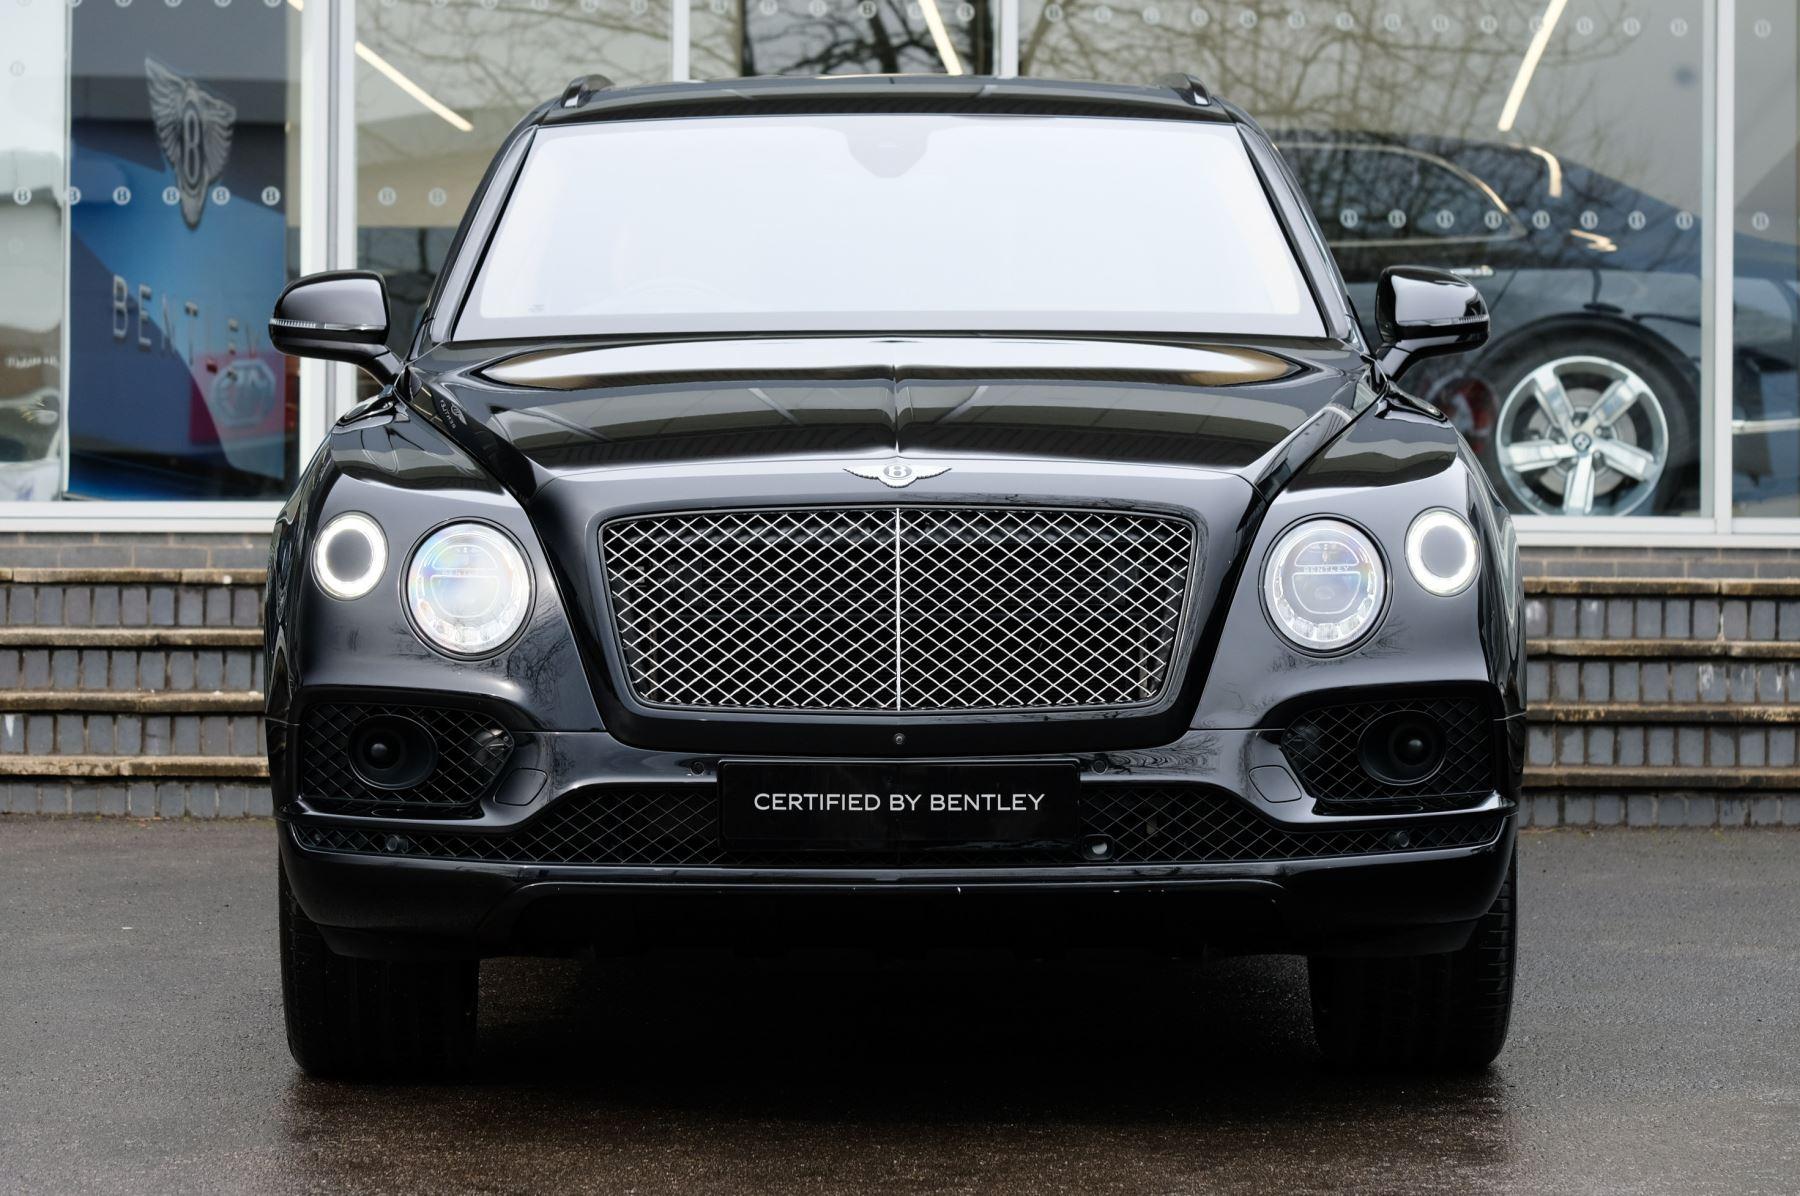 Bentley Bentayga 6.0 W12 5dr - Mulliner Driving Specification  image 2